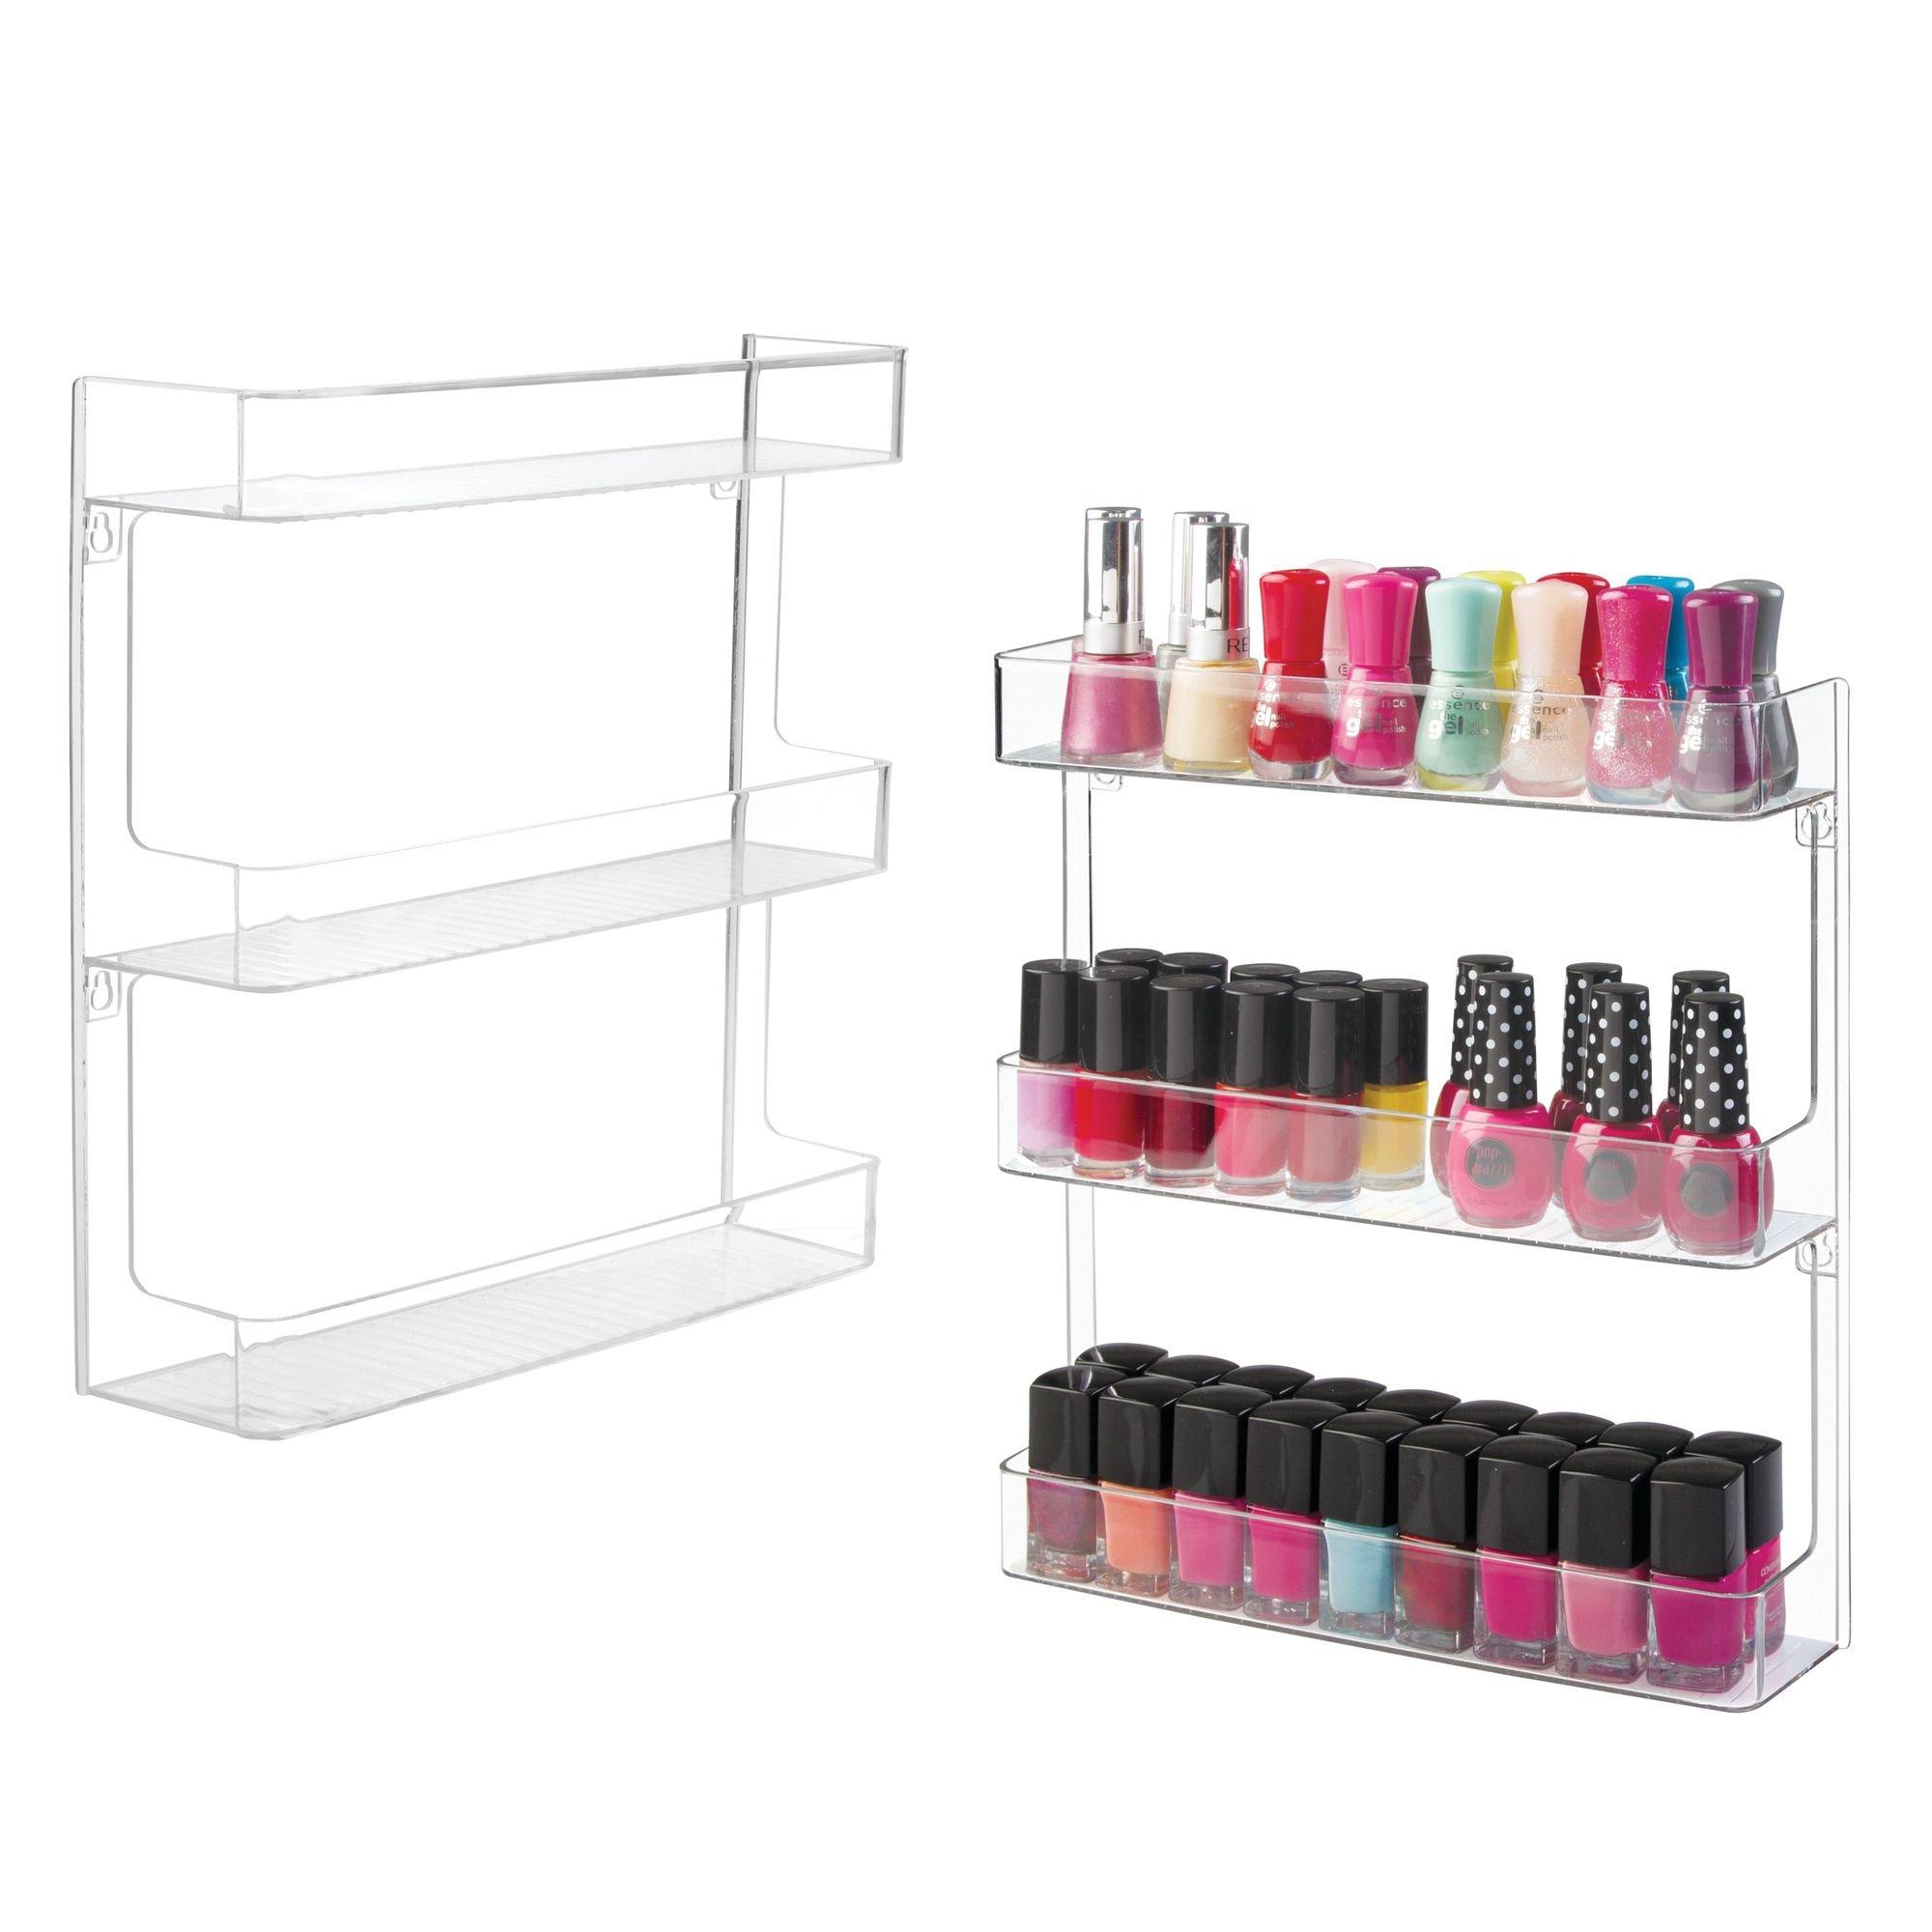 mDesign Wall Mount Plastic Nail Polish & Makeup Organizer Storage Shelf and Display Rack - Clean, Modern, Versatile, 3-Tier, Space Saving Design, Large Capacity - 3 Shelves - Pack of 2, Clear